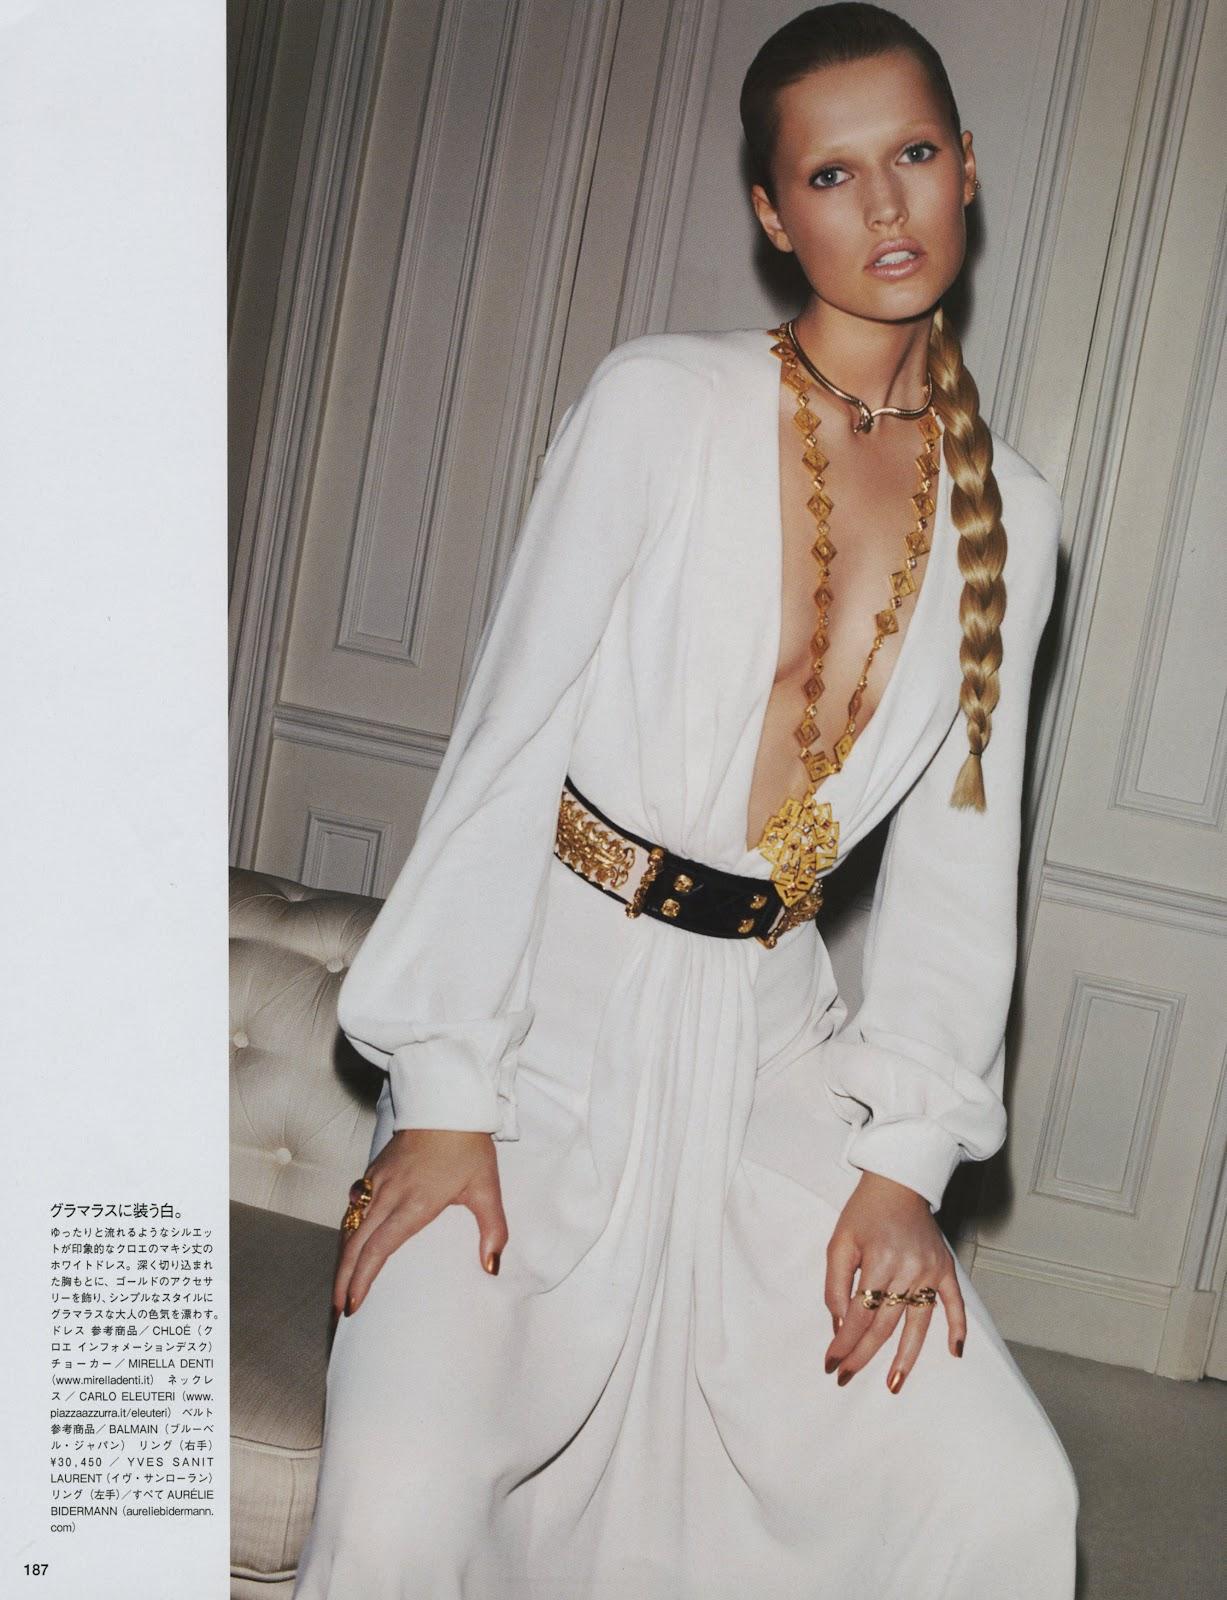 http://2.bp.blogspot.com/-IwwSNOx8Y_0/T_INRjwoduI/AAAAAAAADhM/NZZtx-15500/s1600/062612+Vogue+Japan+(8).jpg